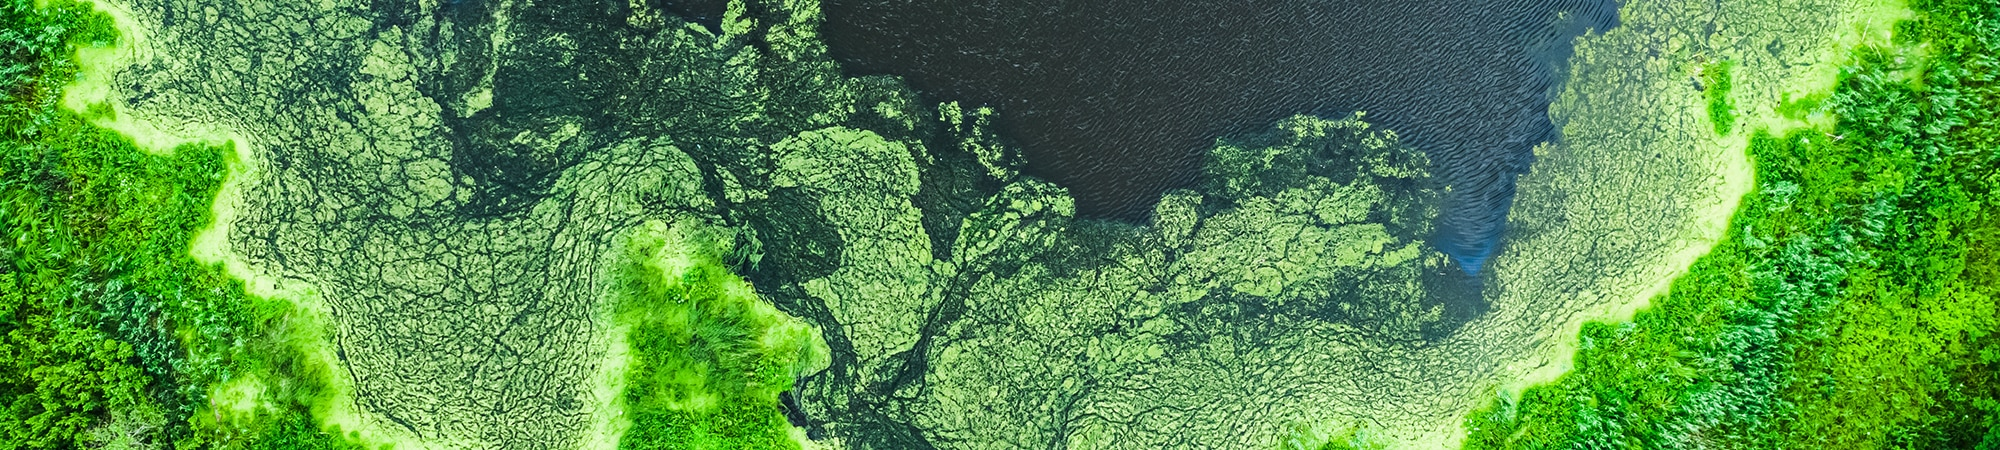 Toxic Algae Removal